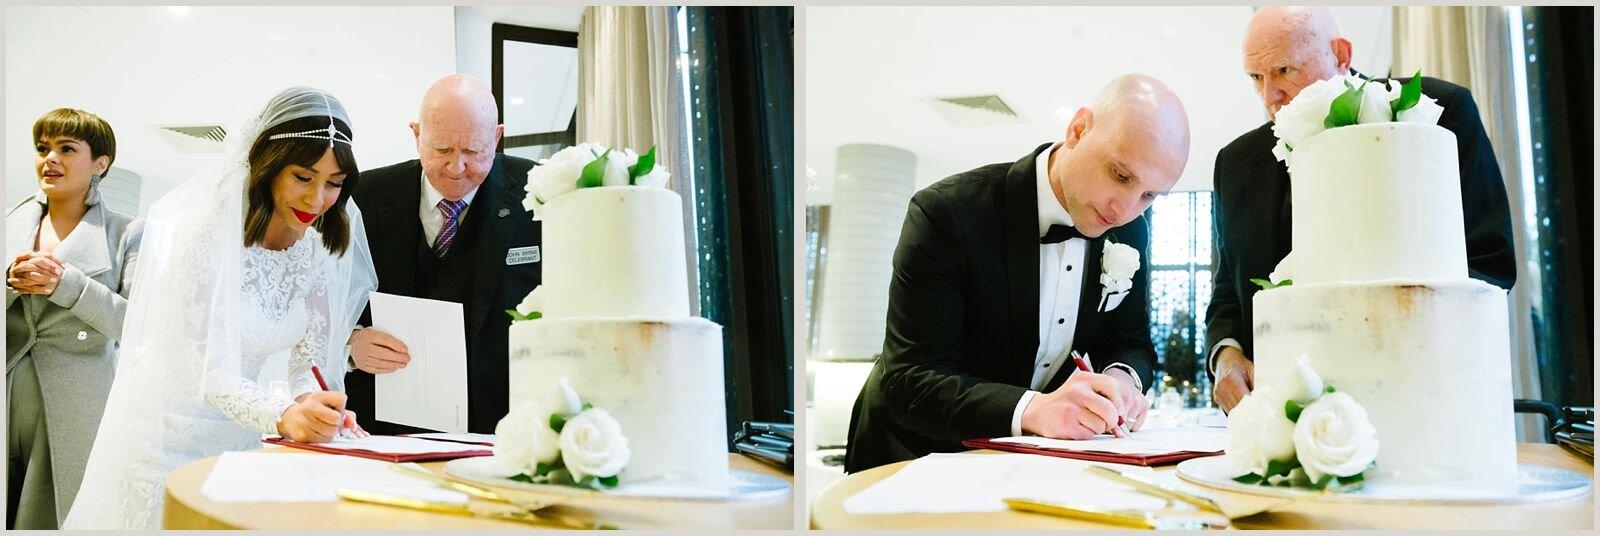 joseph_koprek_wedding_melbourne_the_prince_deck_0070.jpg